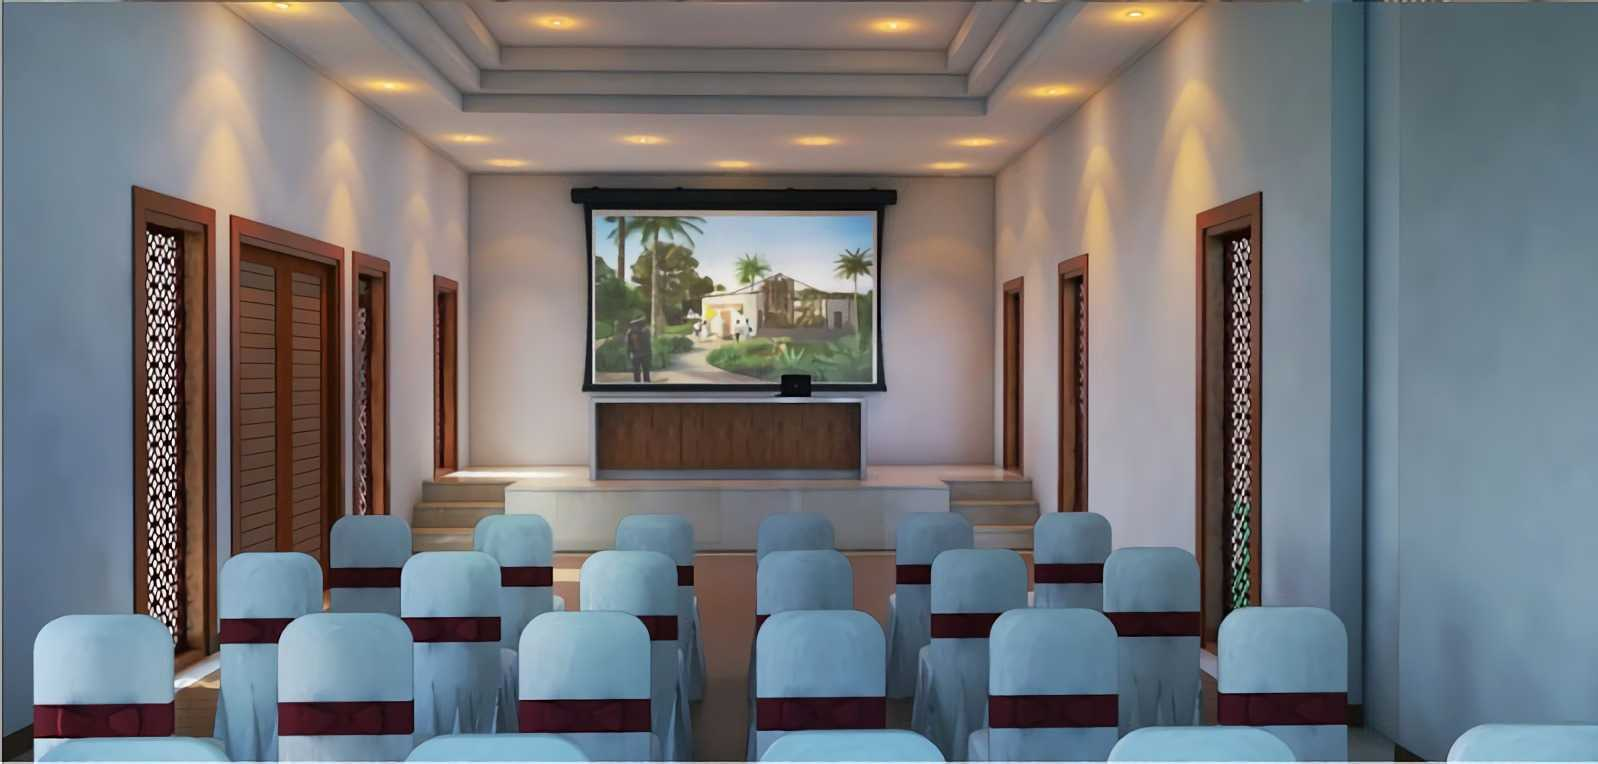 Hg Architects & Designers Associates Taman Wisata Alam Gunung Tunak Lombok, Ntb Lombok, Ntb Aula   24346